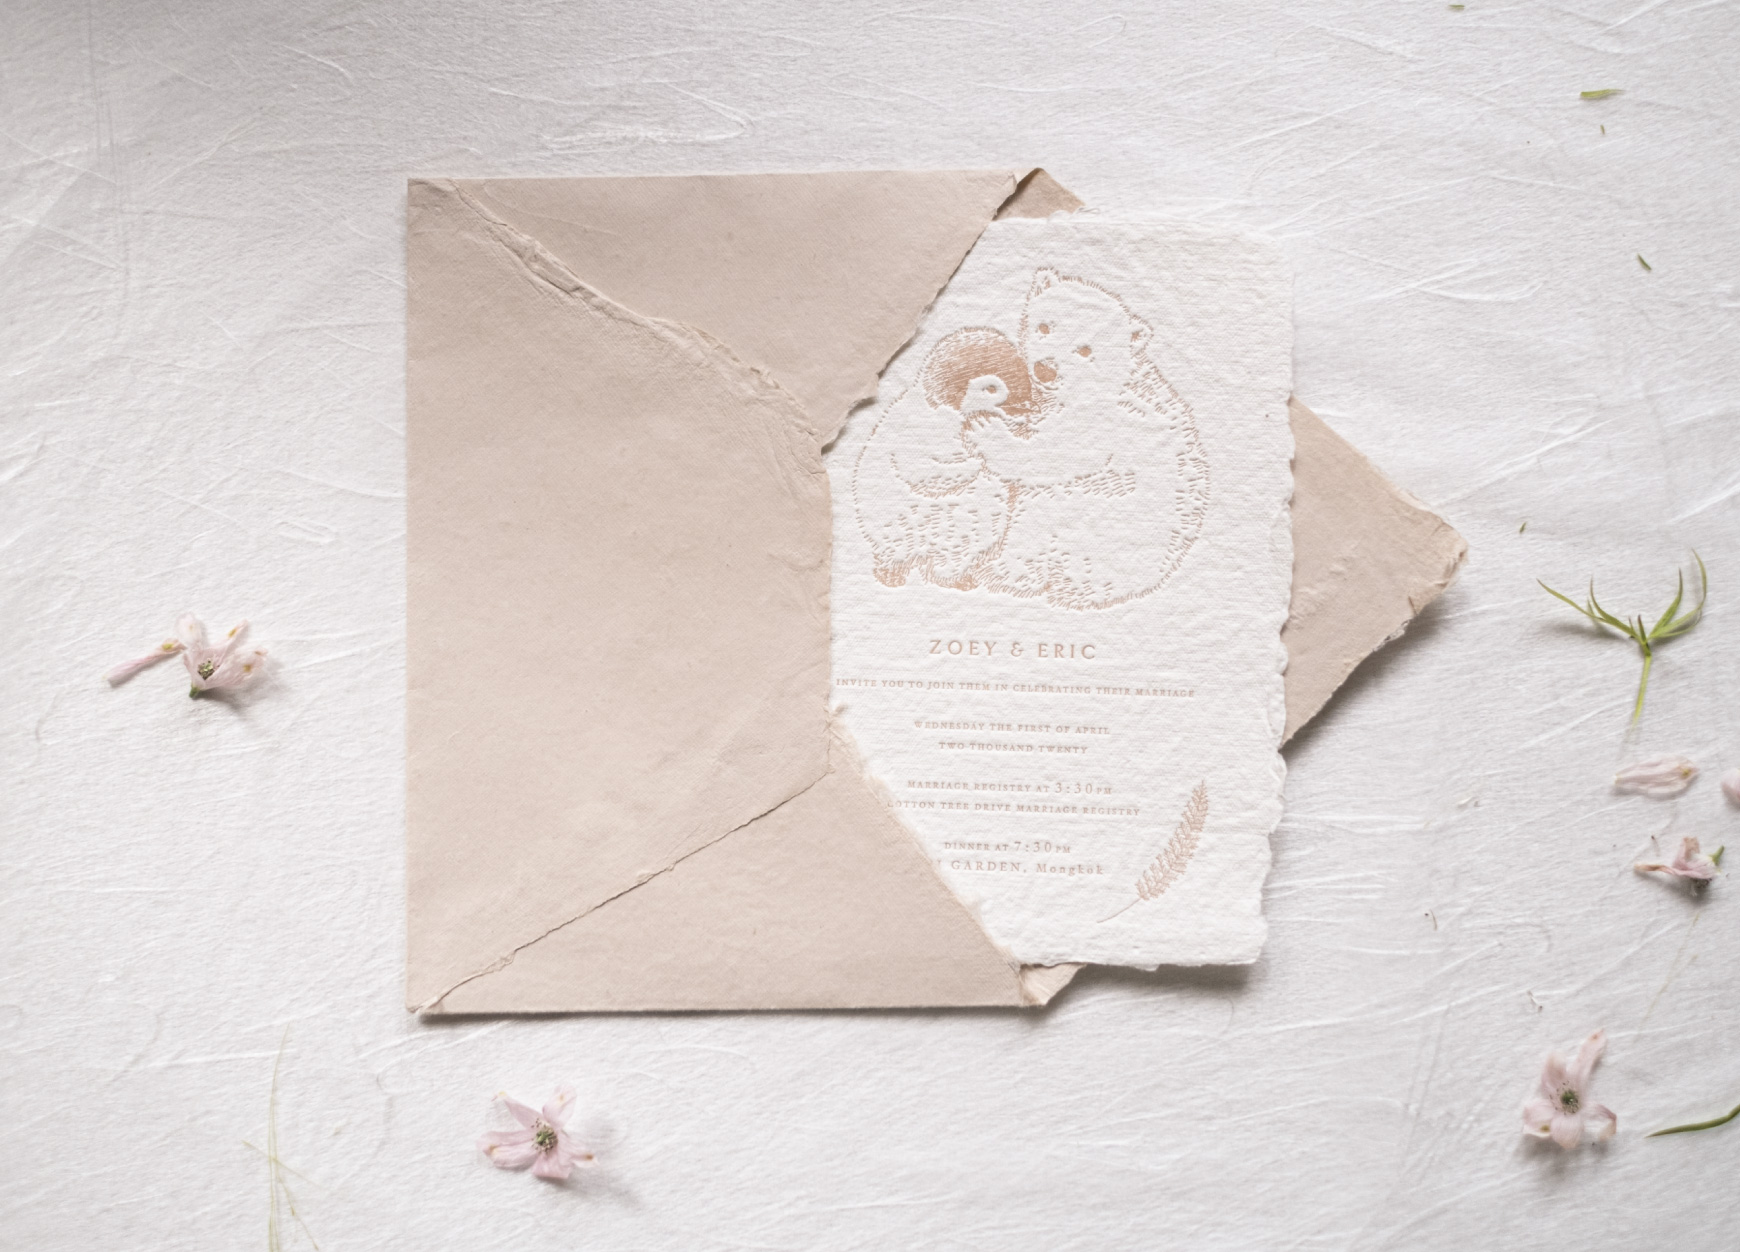 animal wedding invitation in letterpress in blush color with cotton rag paper envelope